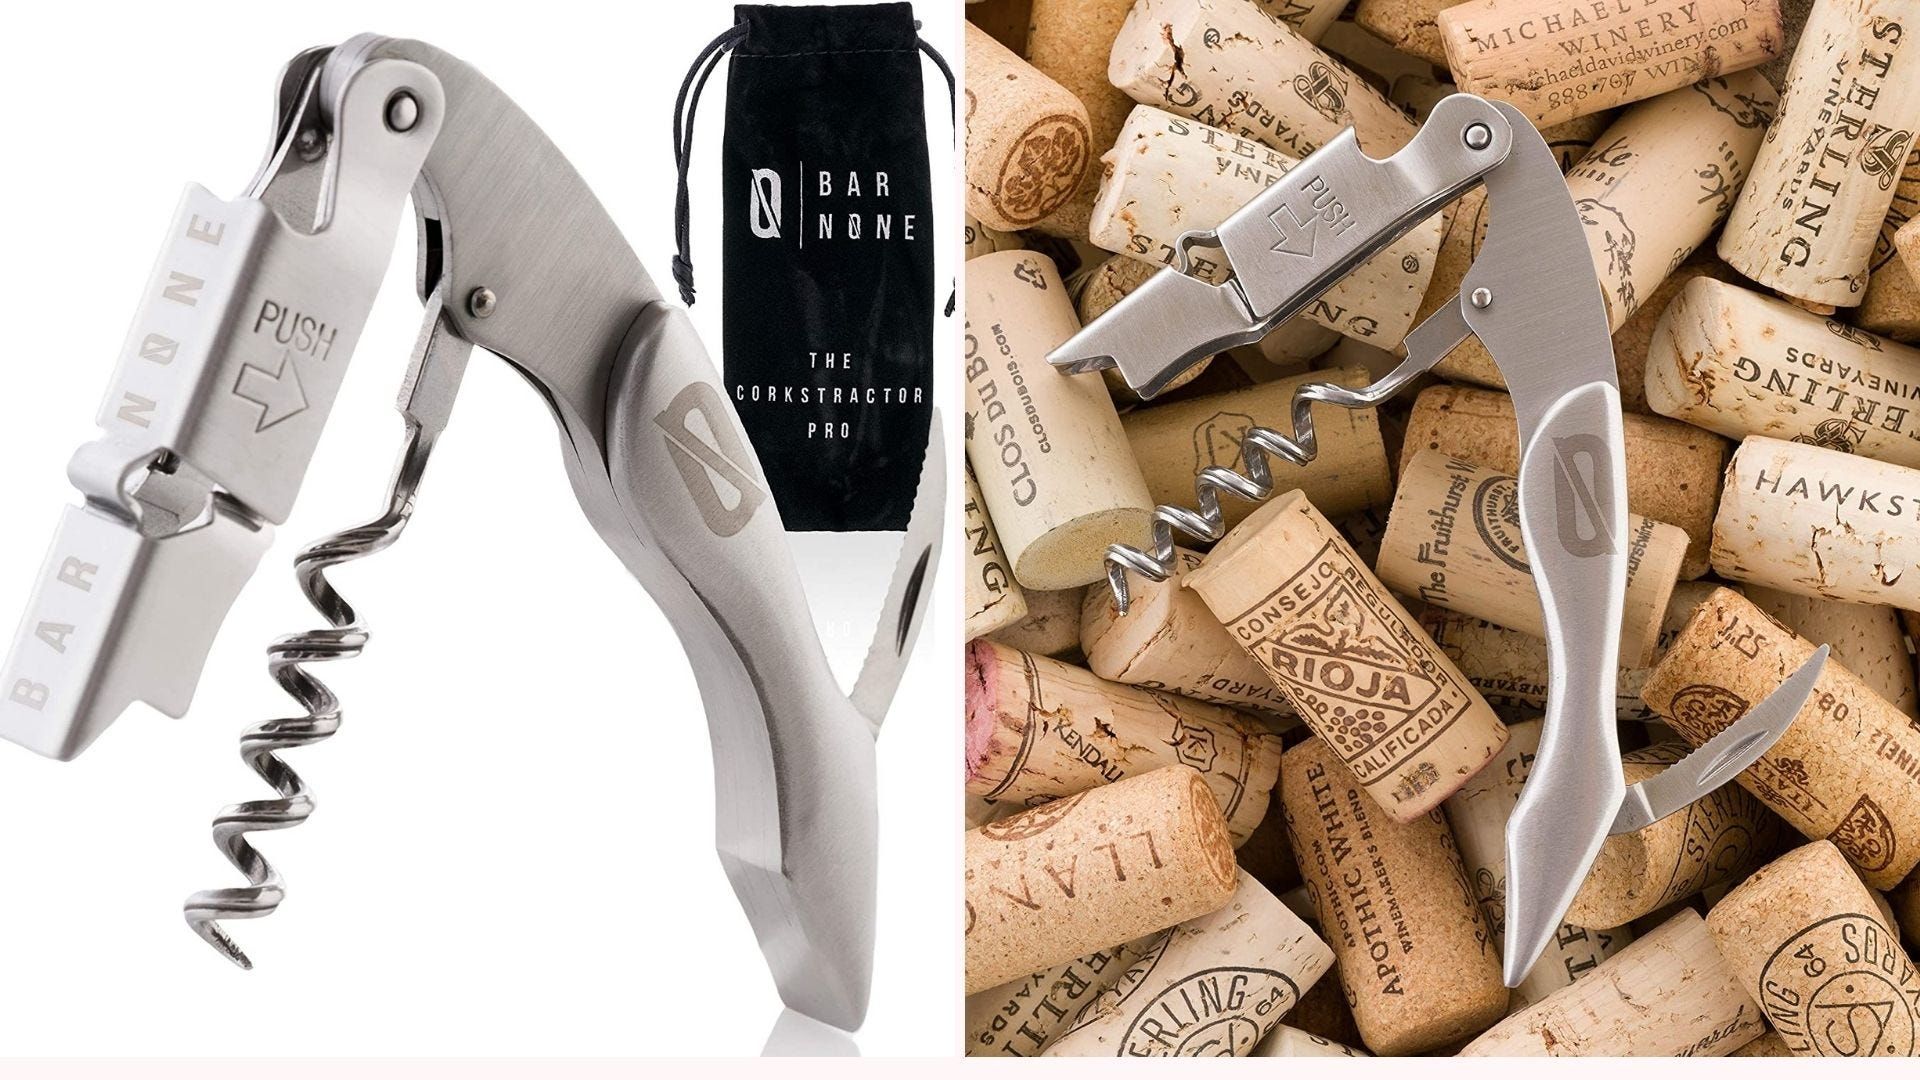 Wine key and corkscrews.